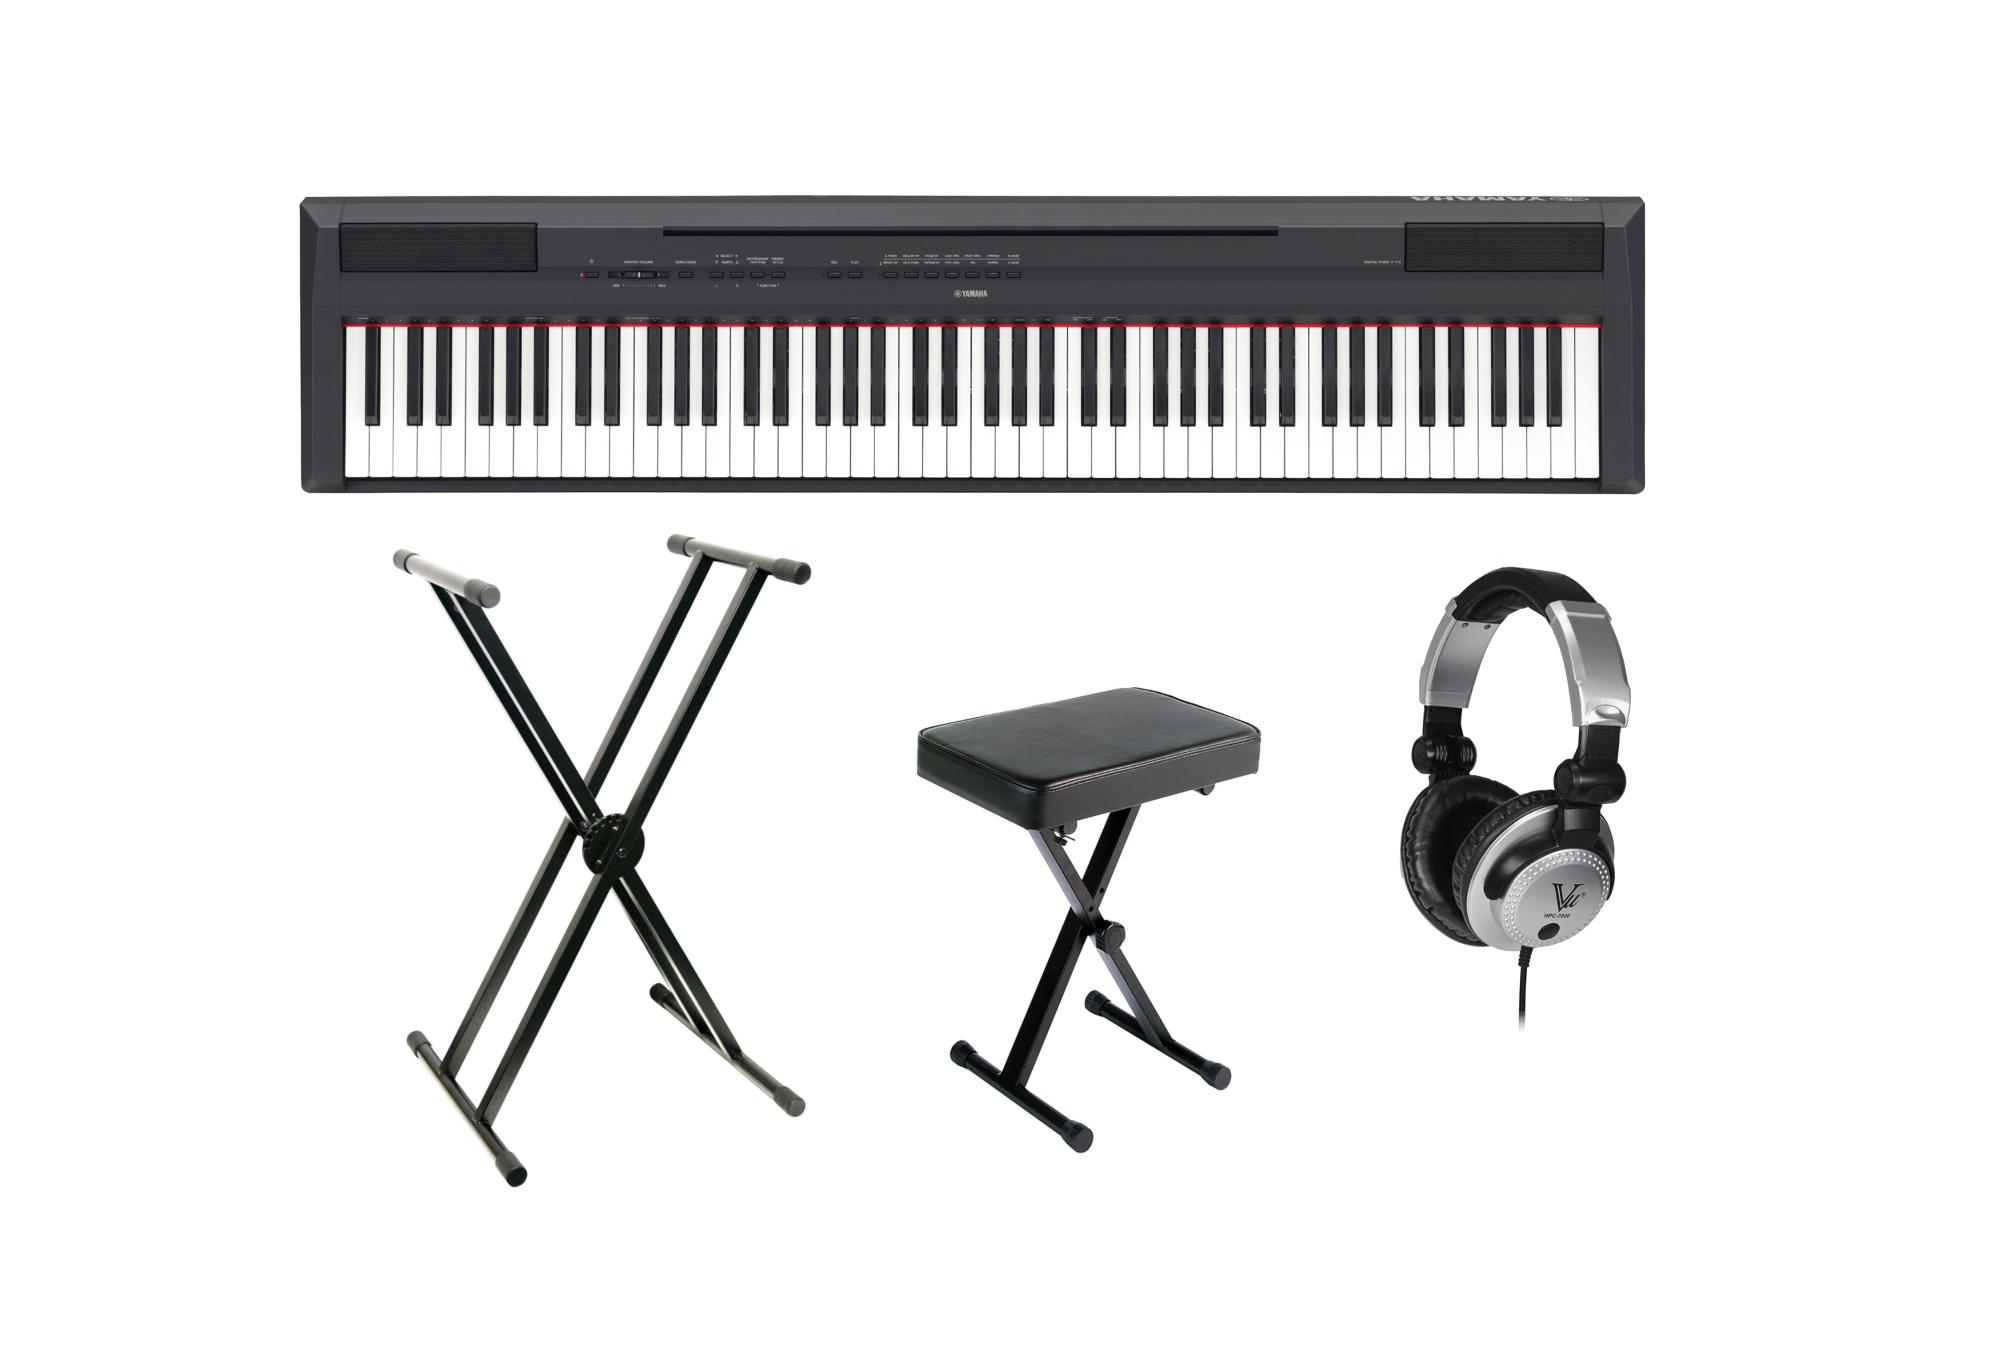 Yamaha P115B-BASICPCK-K Digital Piano And Accessories Exclusive Bundle